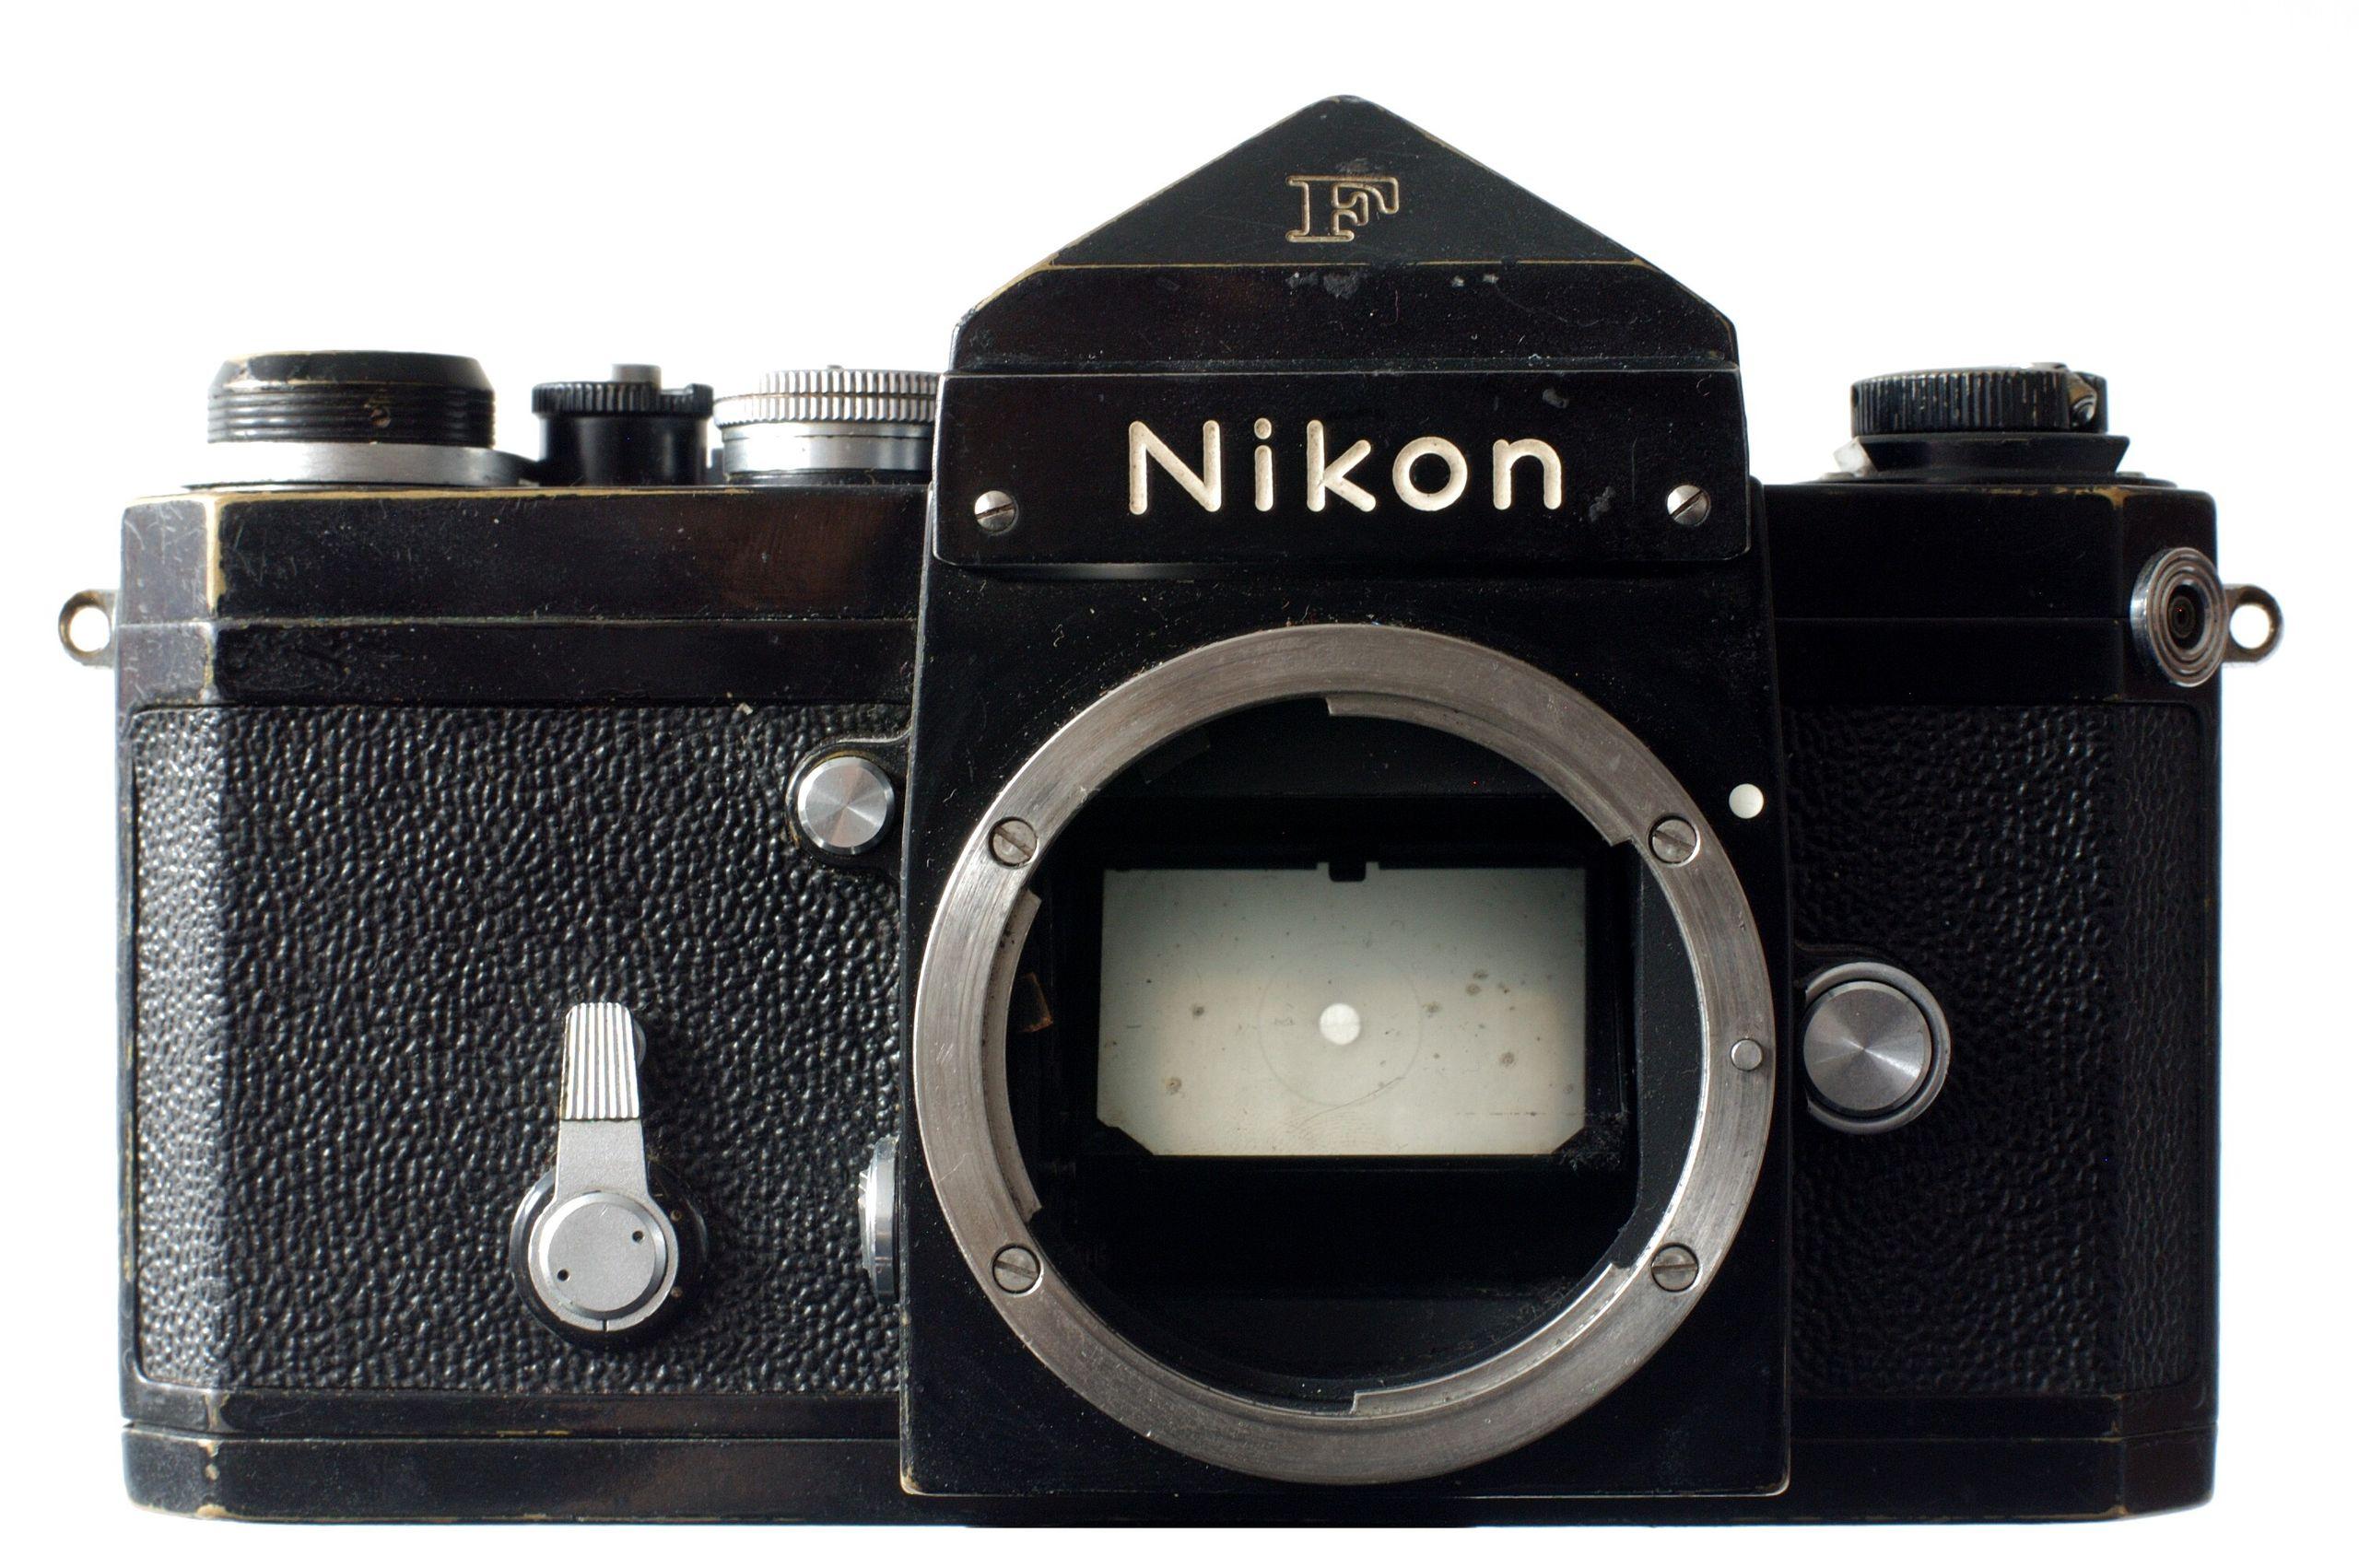 Nikon Vollformat Systemkamera mit neuem Z-Mount im Anflug?